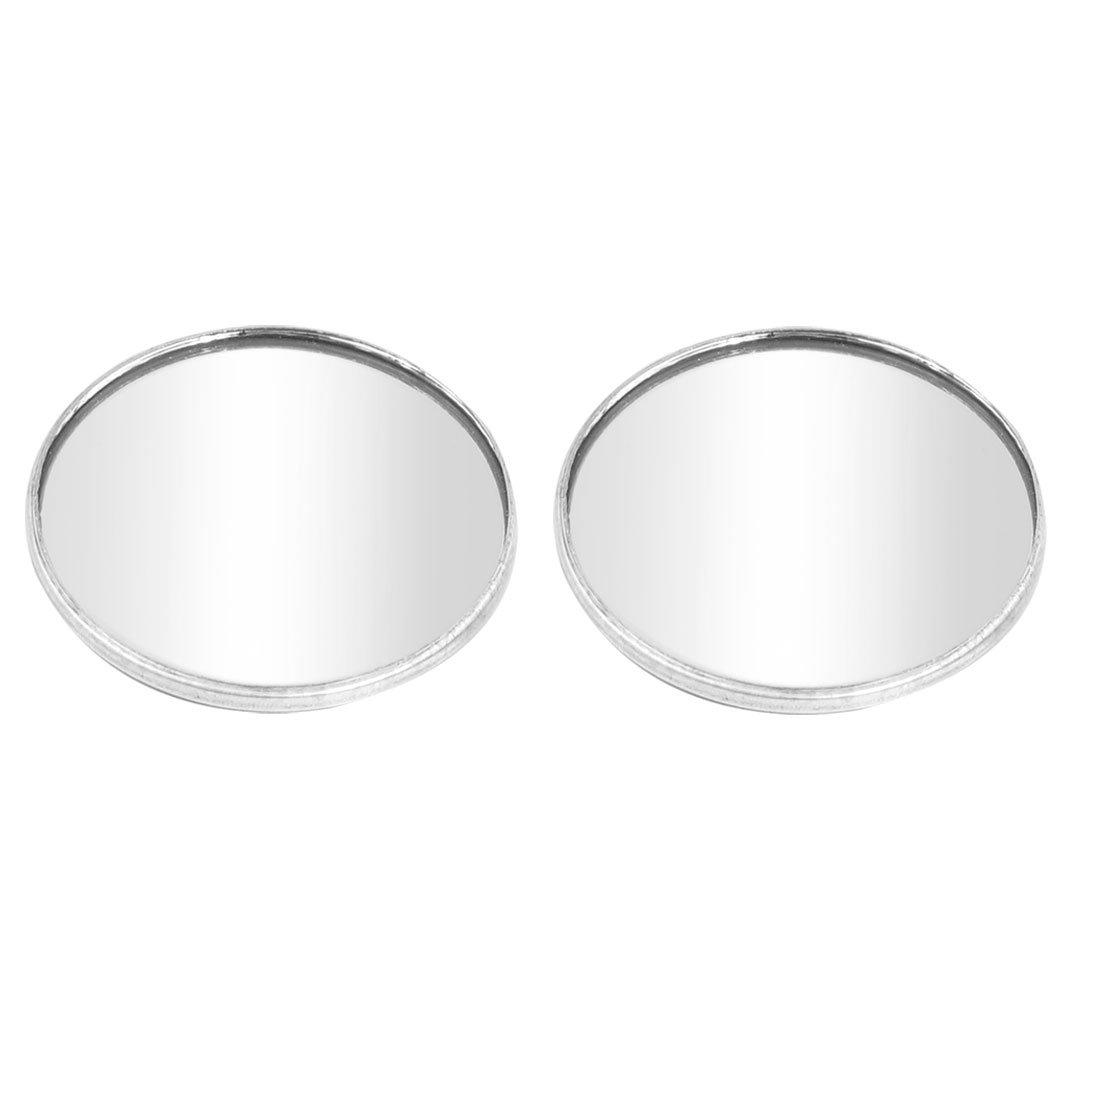 uxcell® 2pcs Driver Wide Angle Convex Car Mirror Blind Spot Silver Tone 48.5mm Diameter